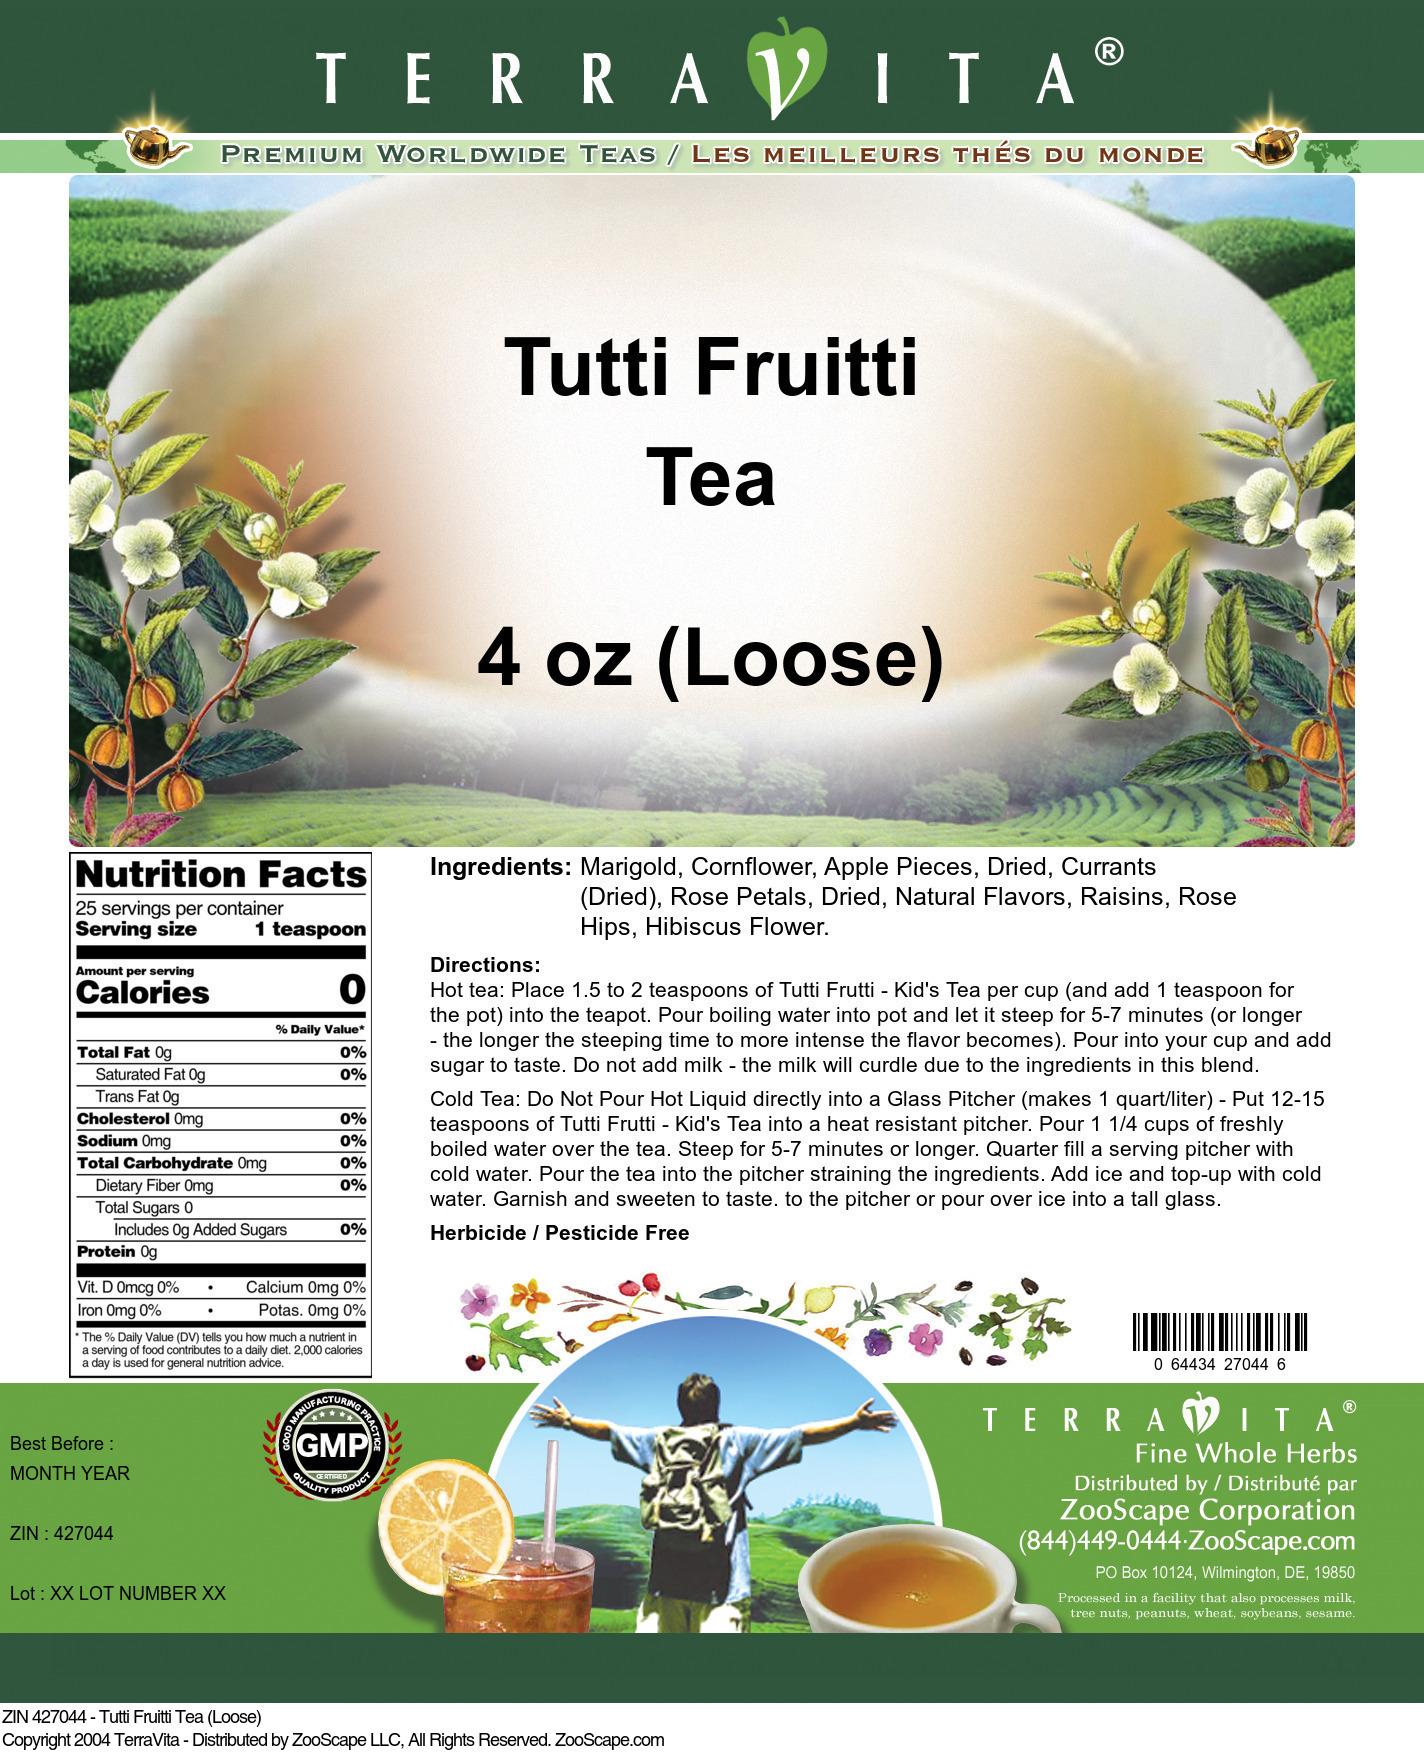 Tutti Fruitti Tea (Loose)